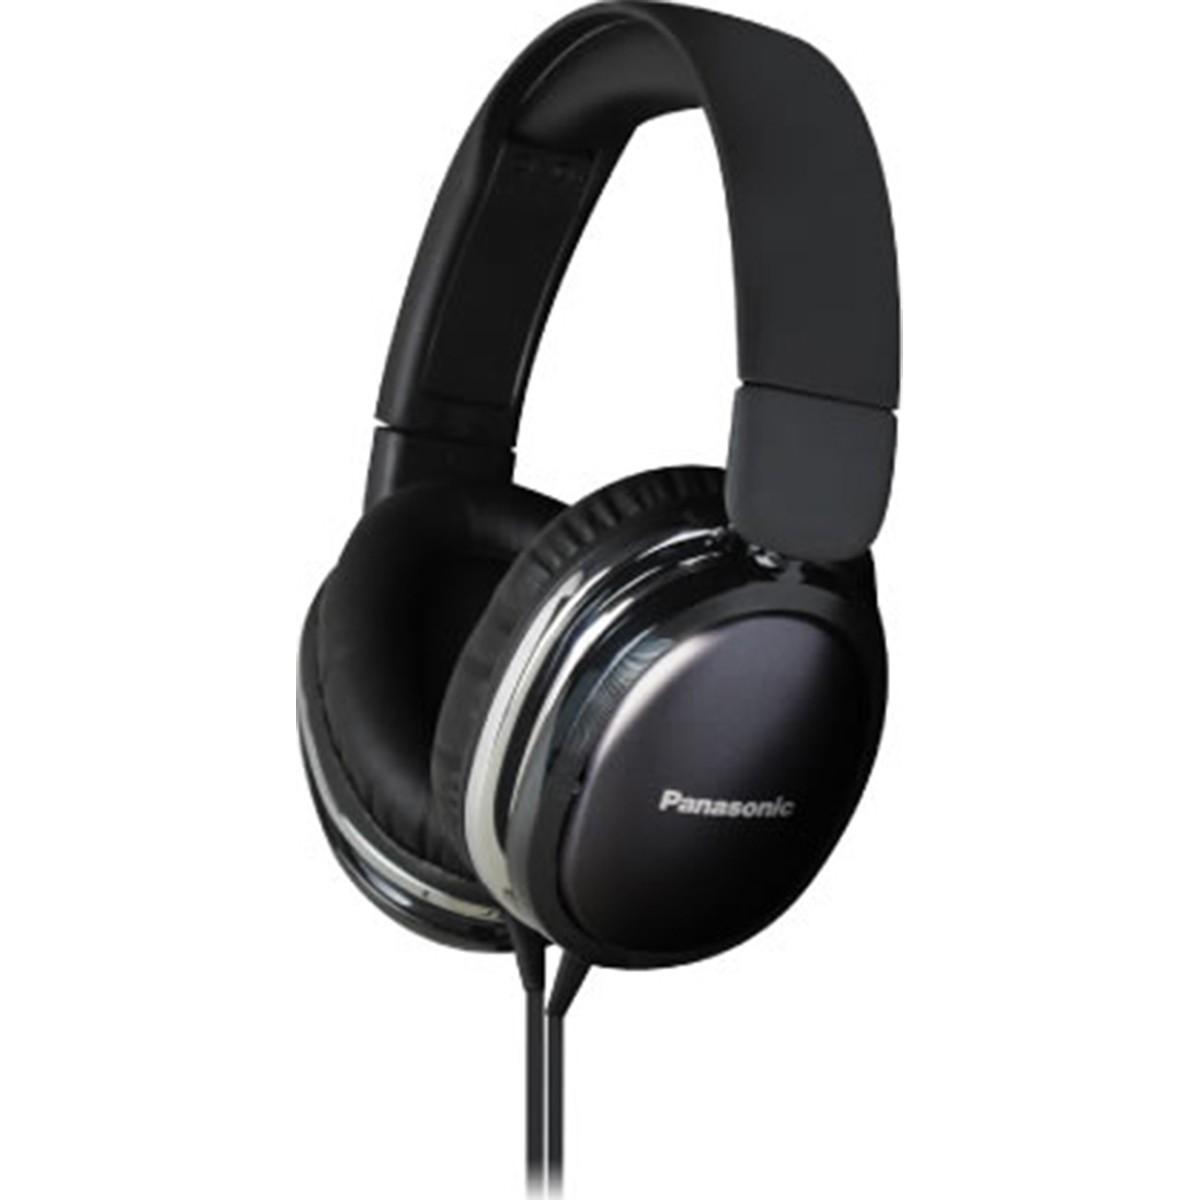 Panasonic RP-HX350M Fone de Ouvido Com Microfone, Preto